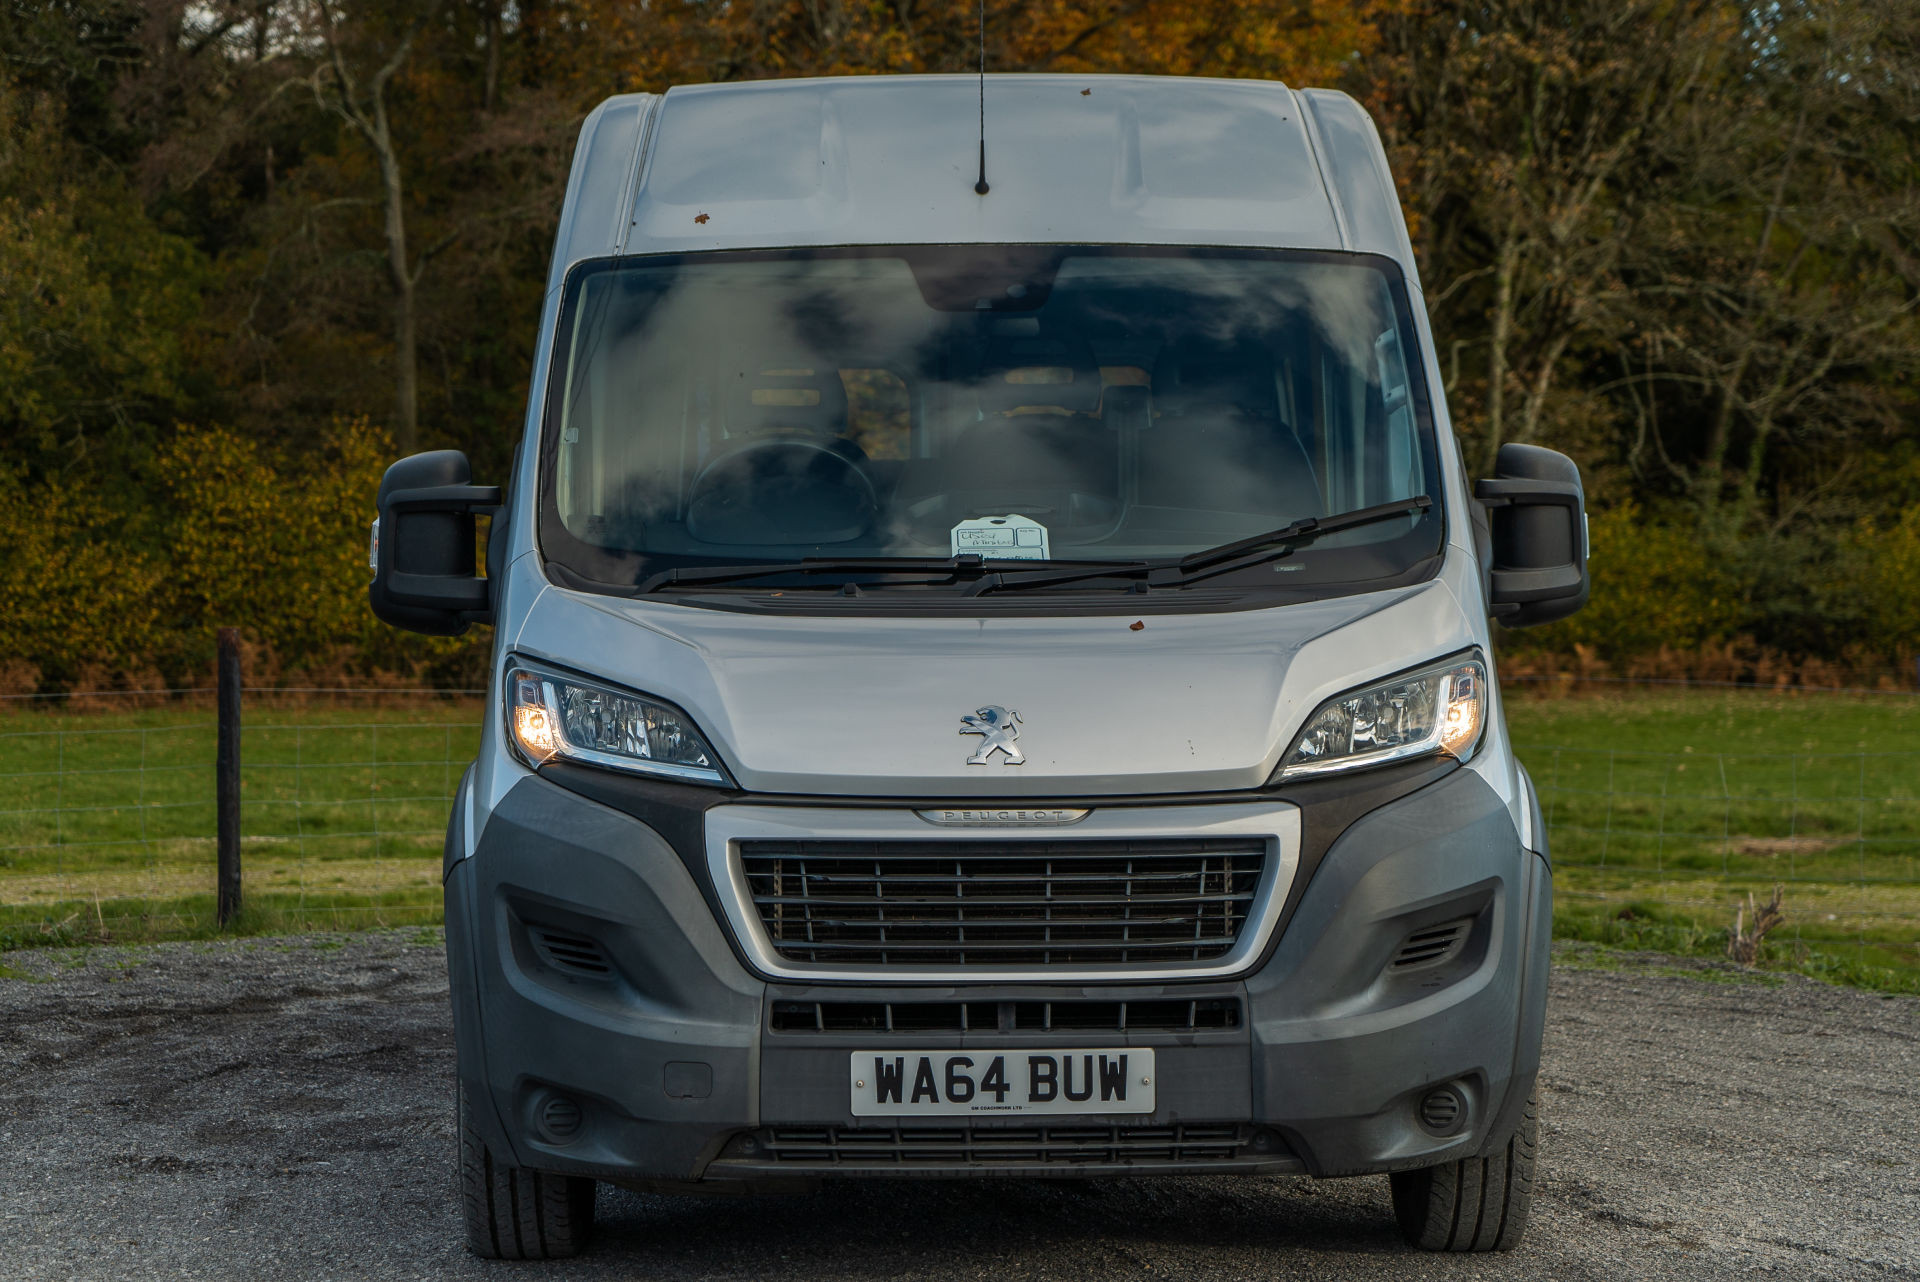 2015 Peugeot Boxer 17 Seater Accessible Minibus for Sale - Image 1